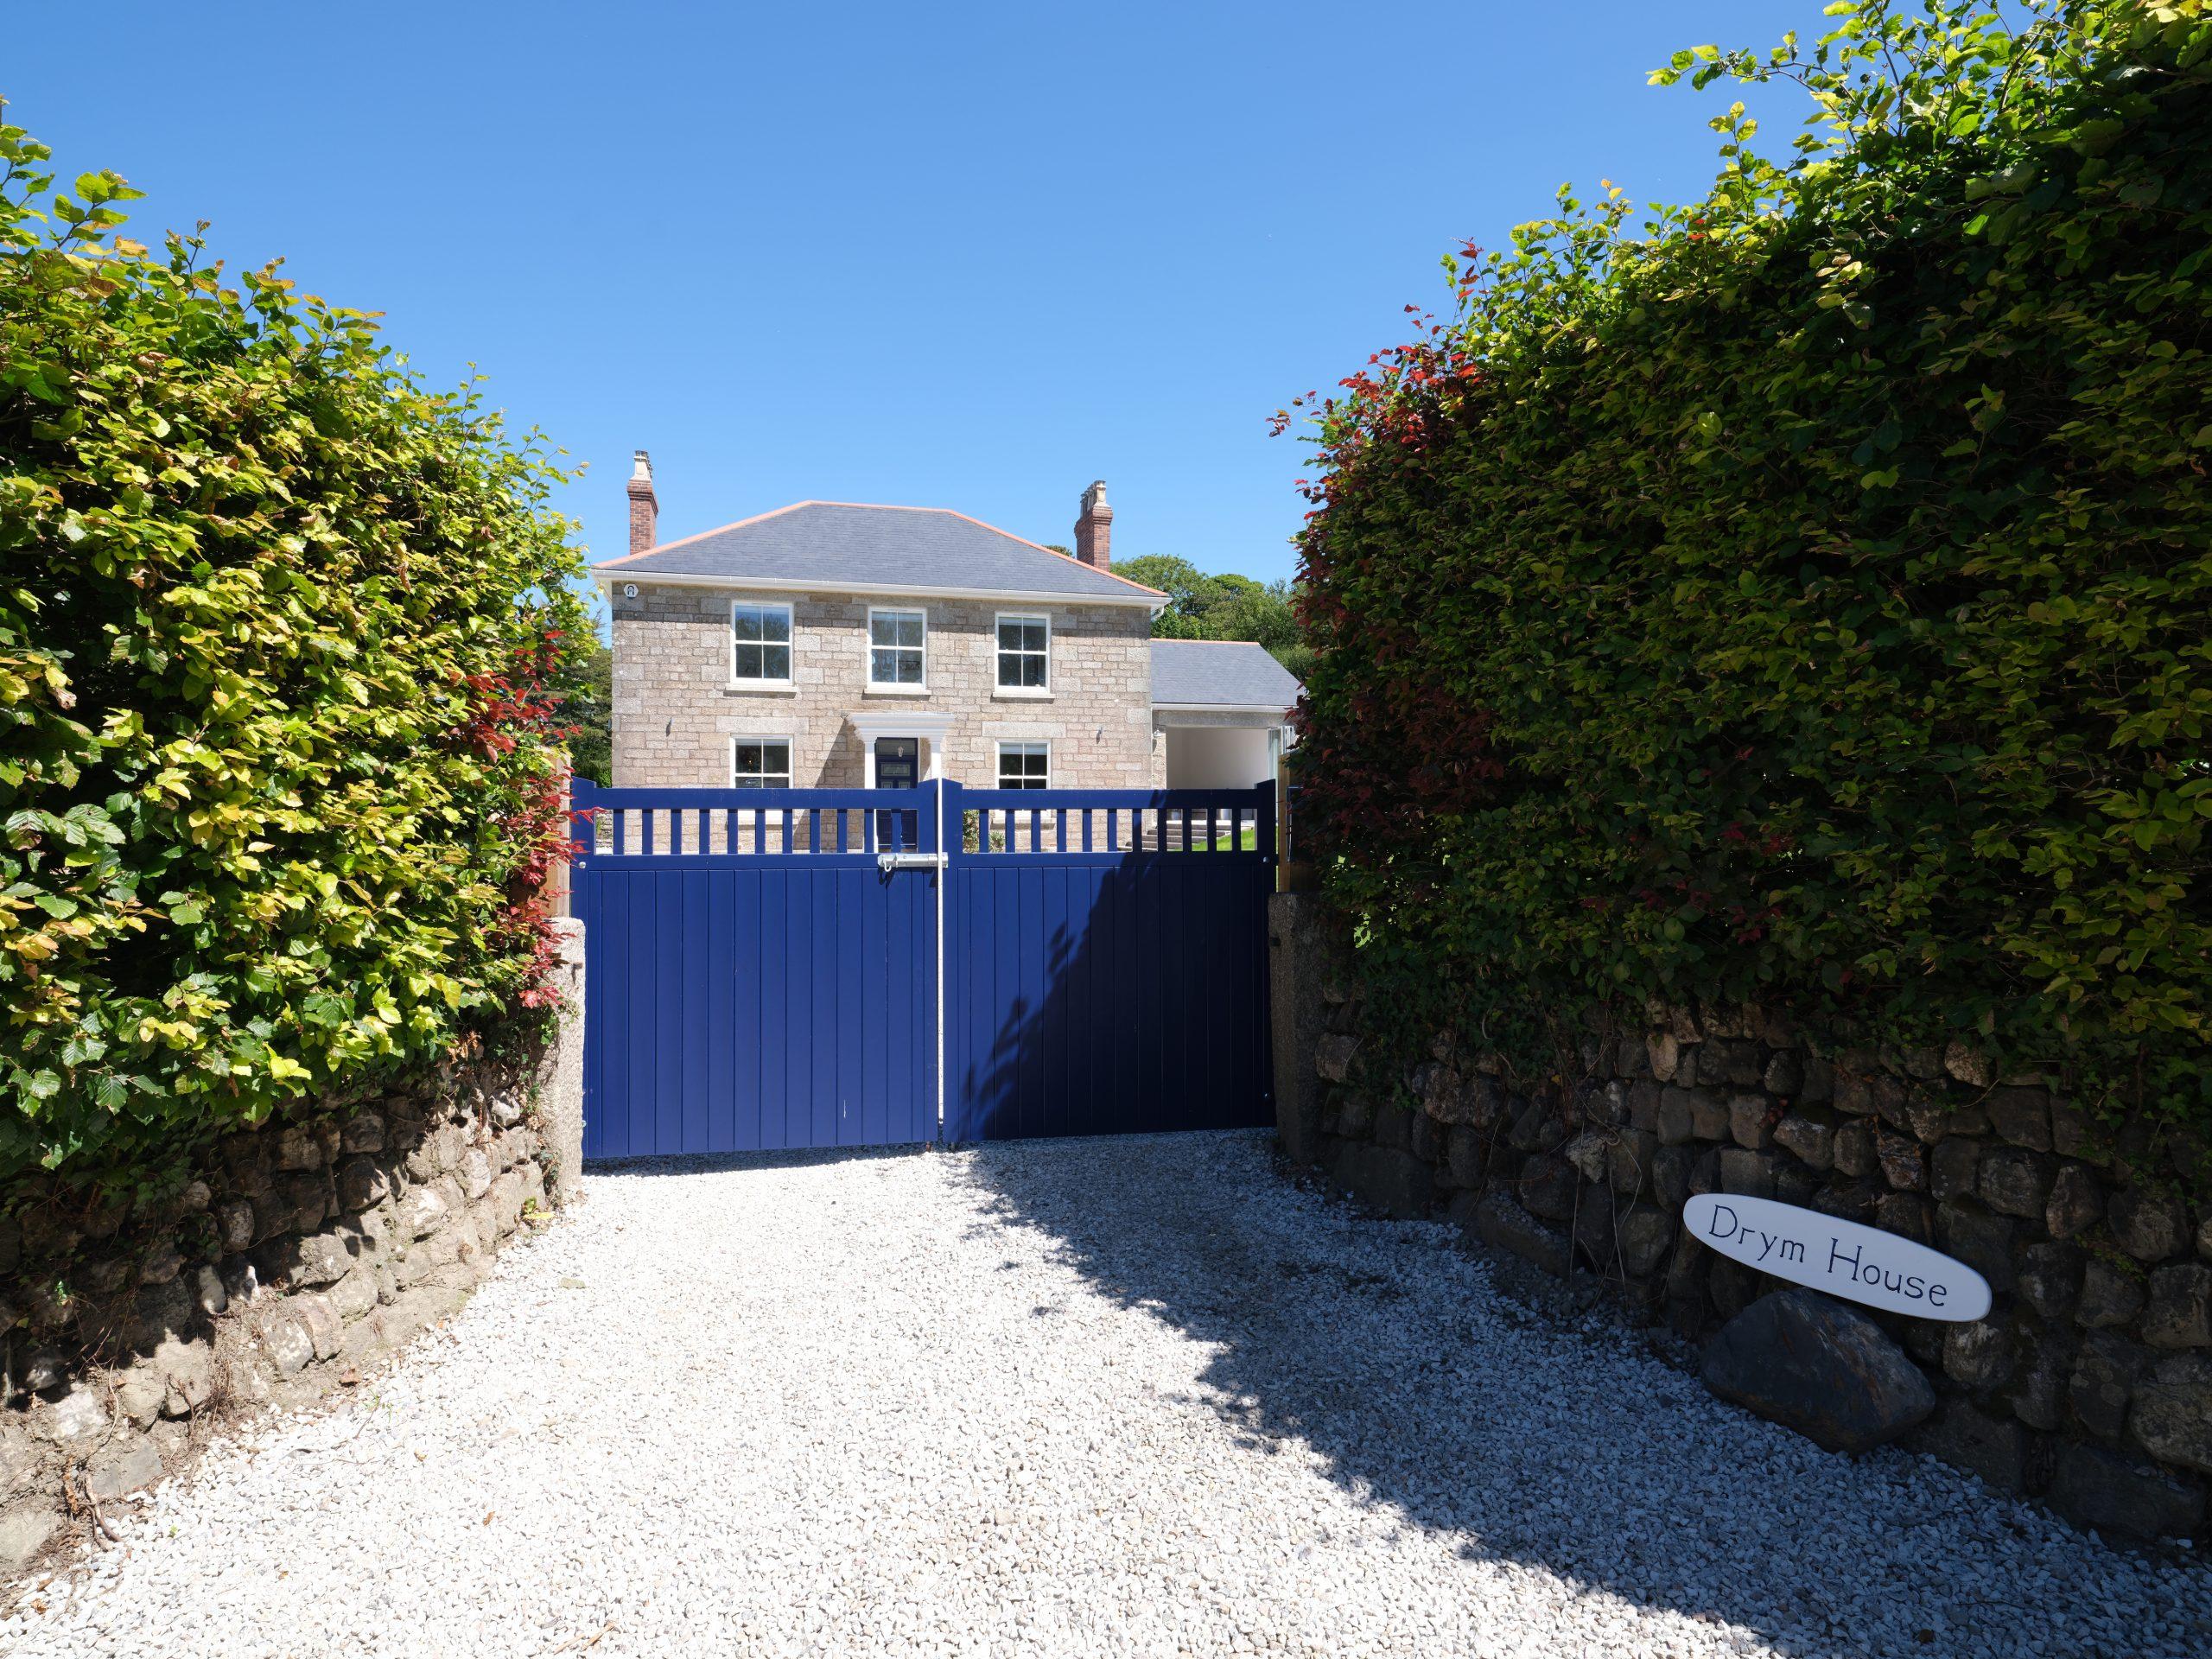 Drym House: Entrance Gate